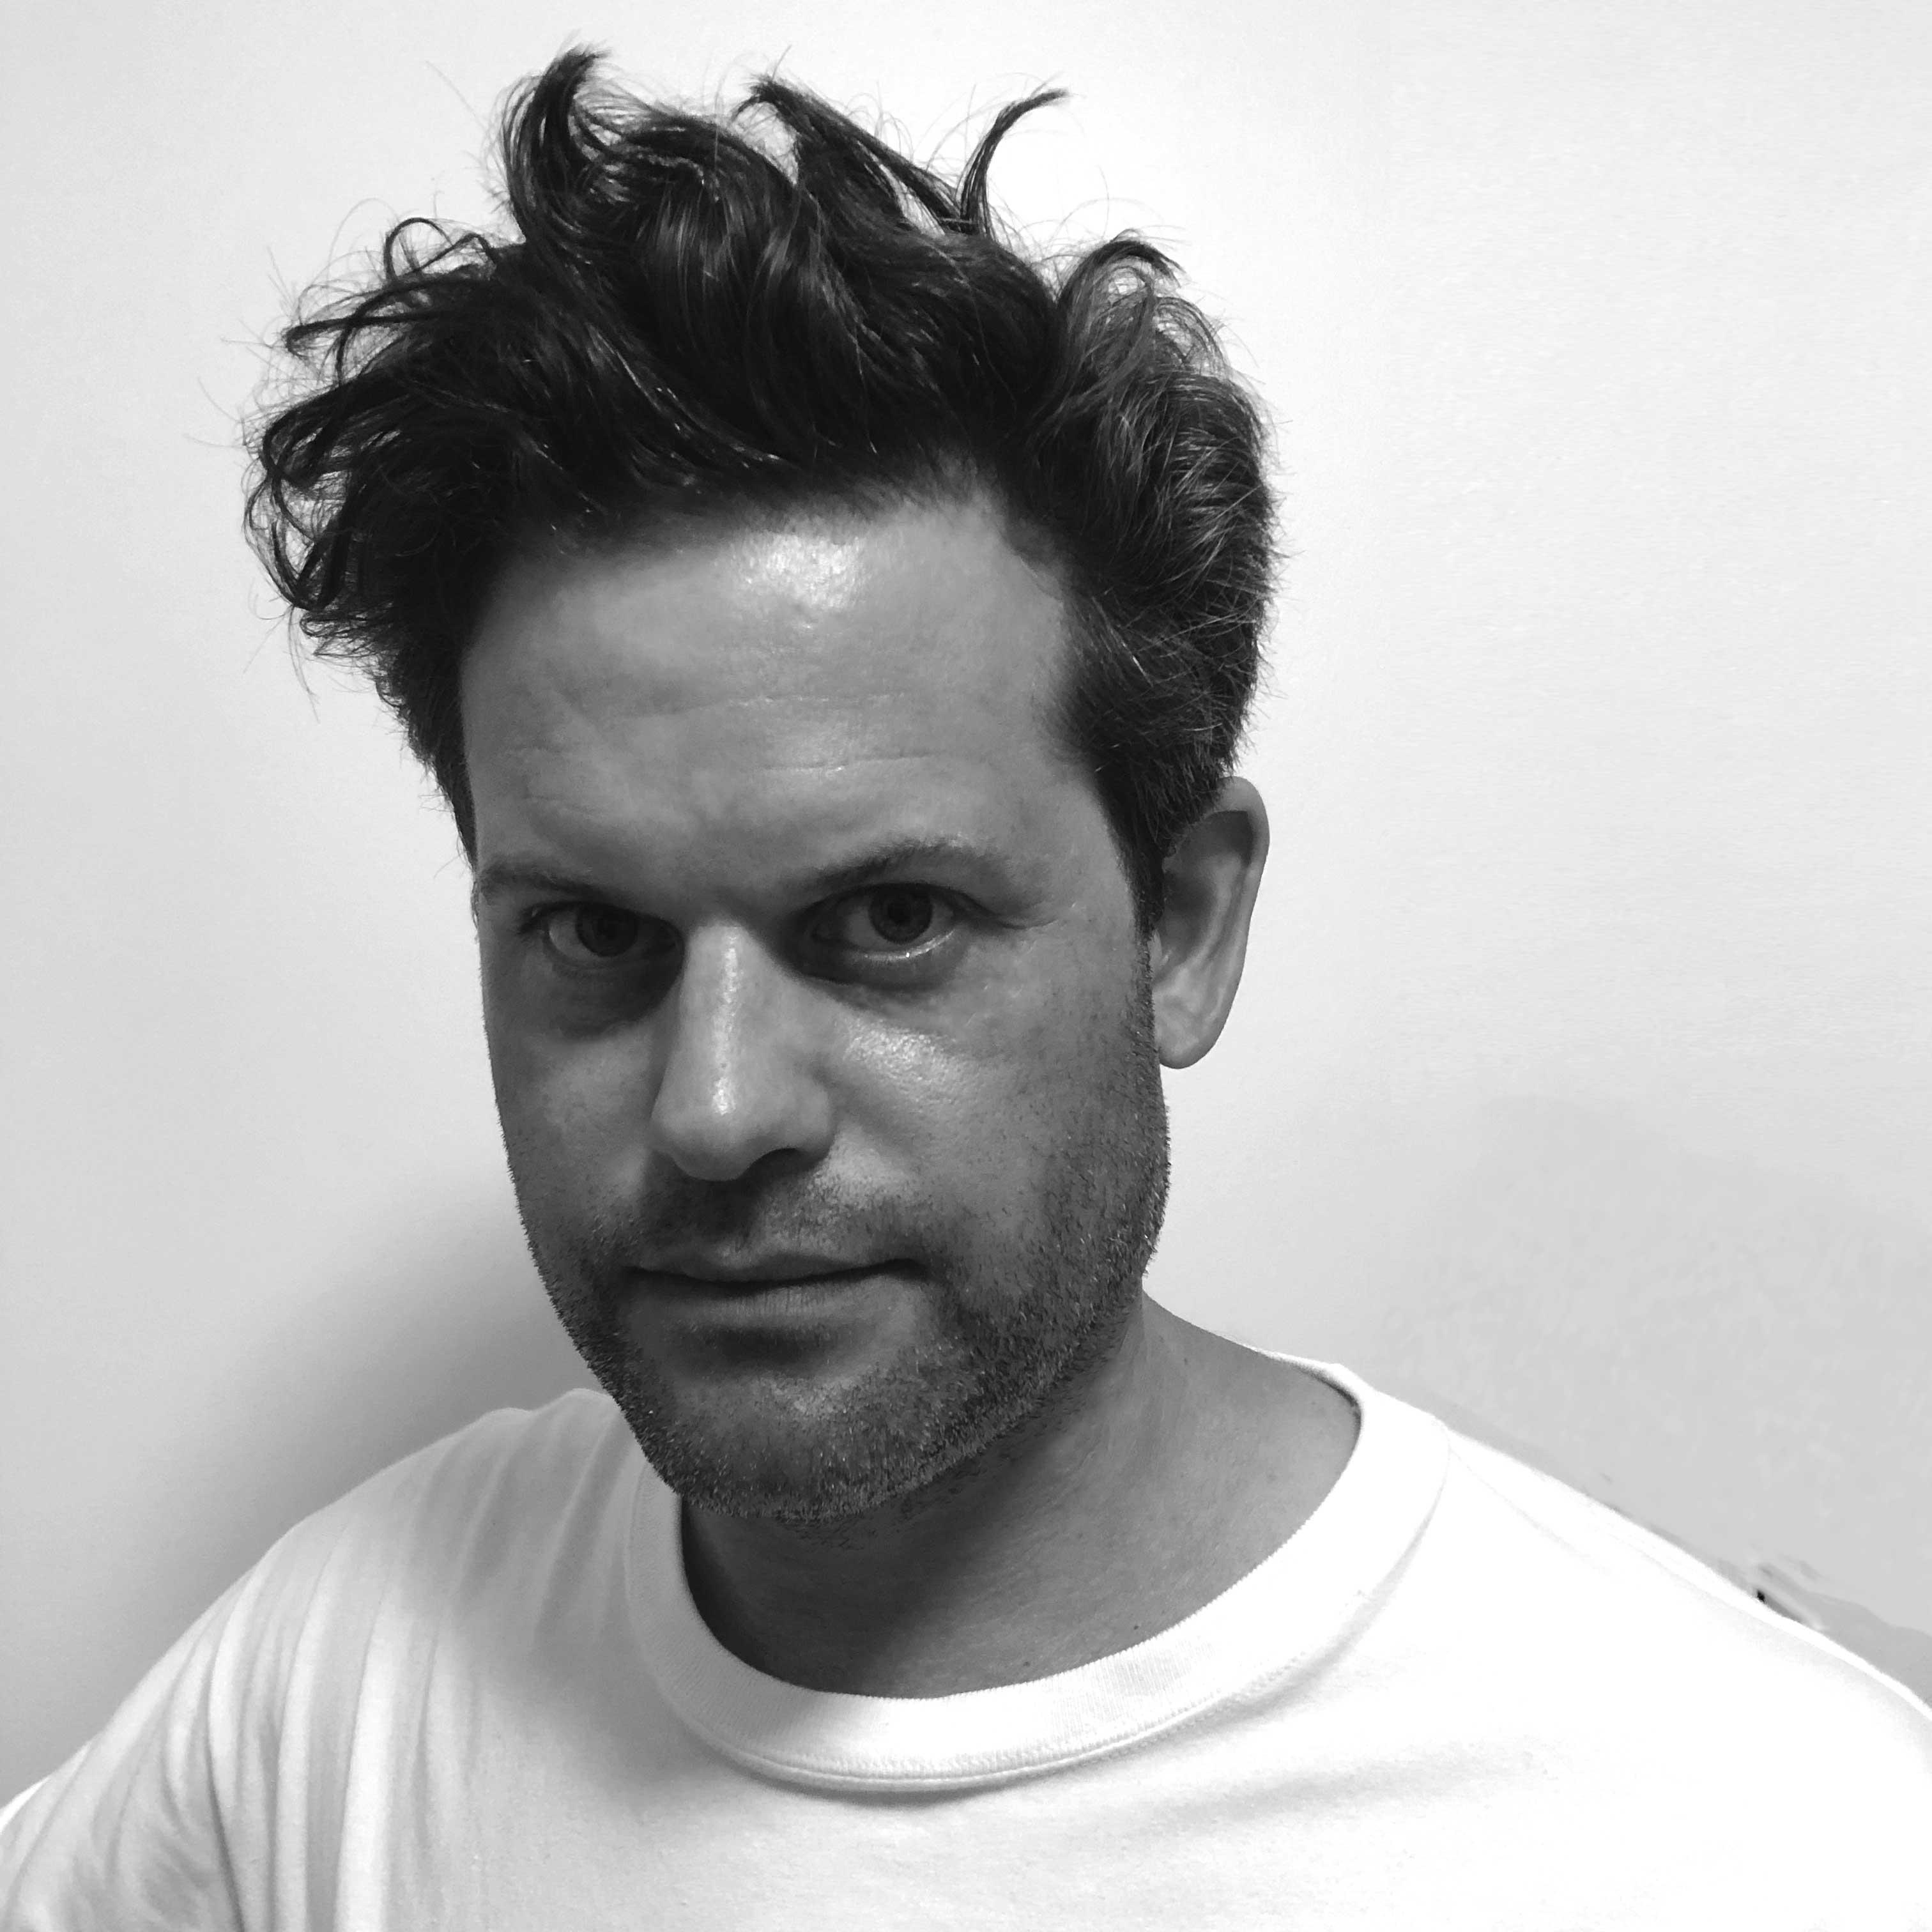 Ben Shrimpton Partner / Creative Director Shrimpton Agency